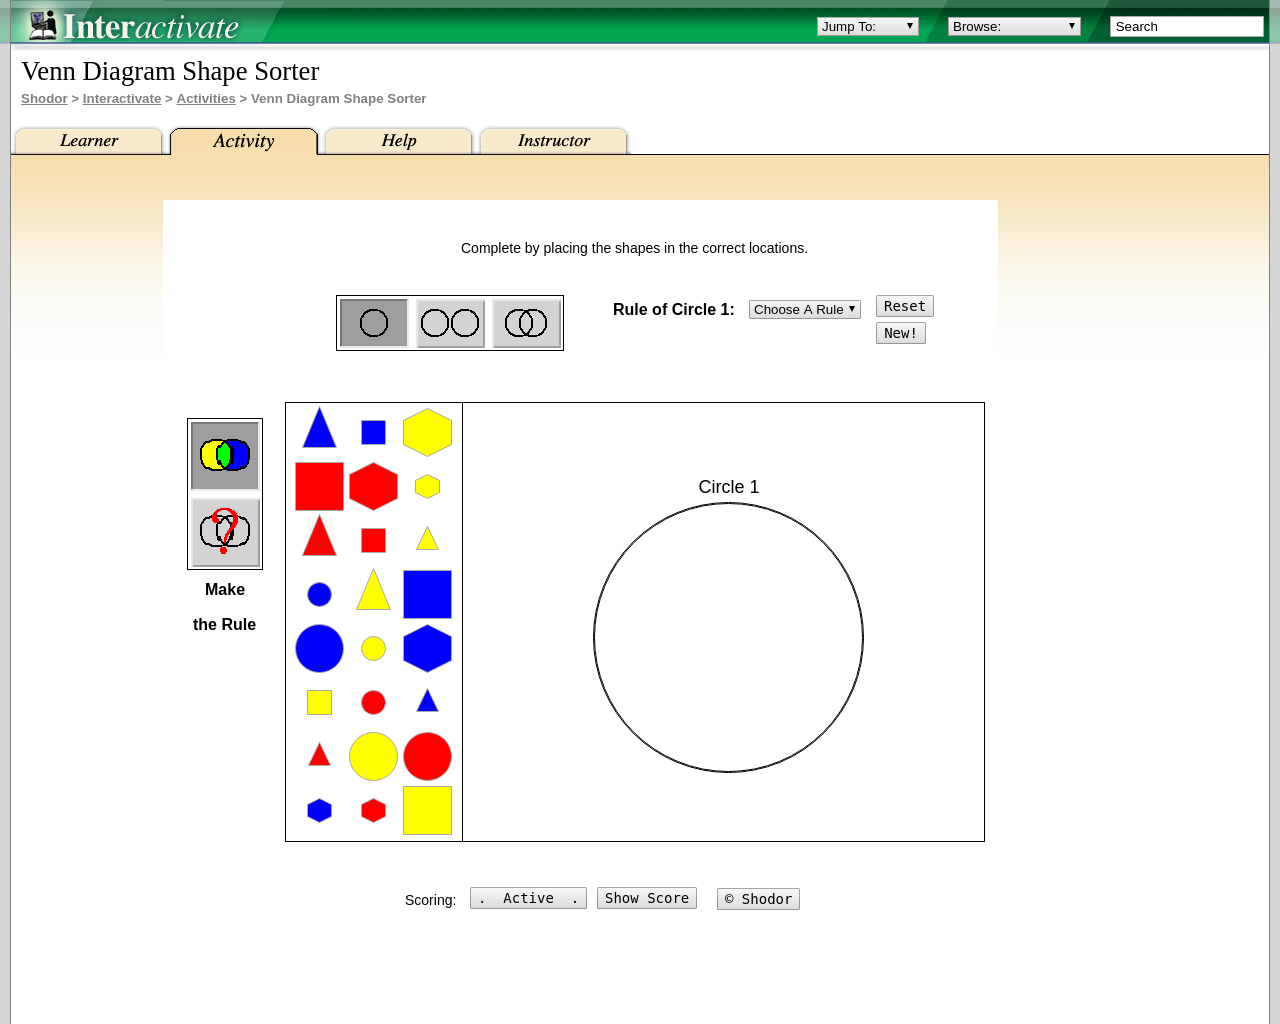 Venn Diagram - shape sorting